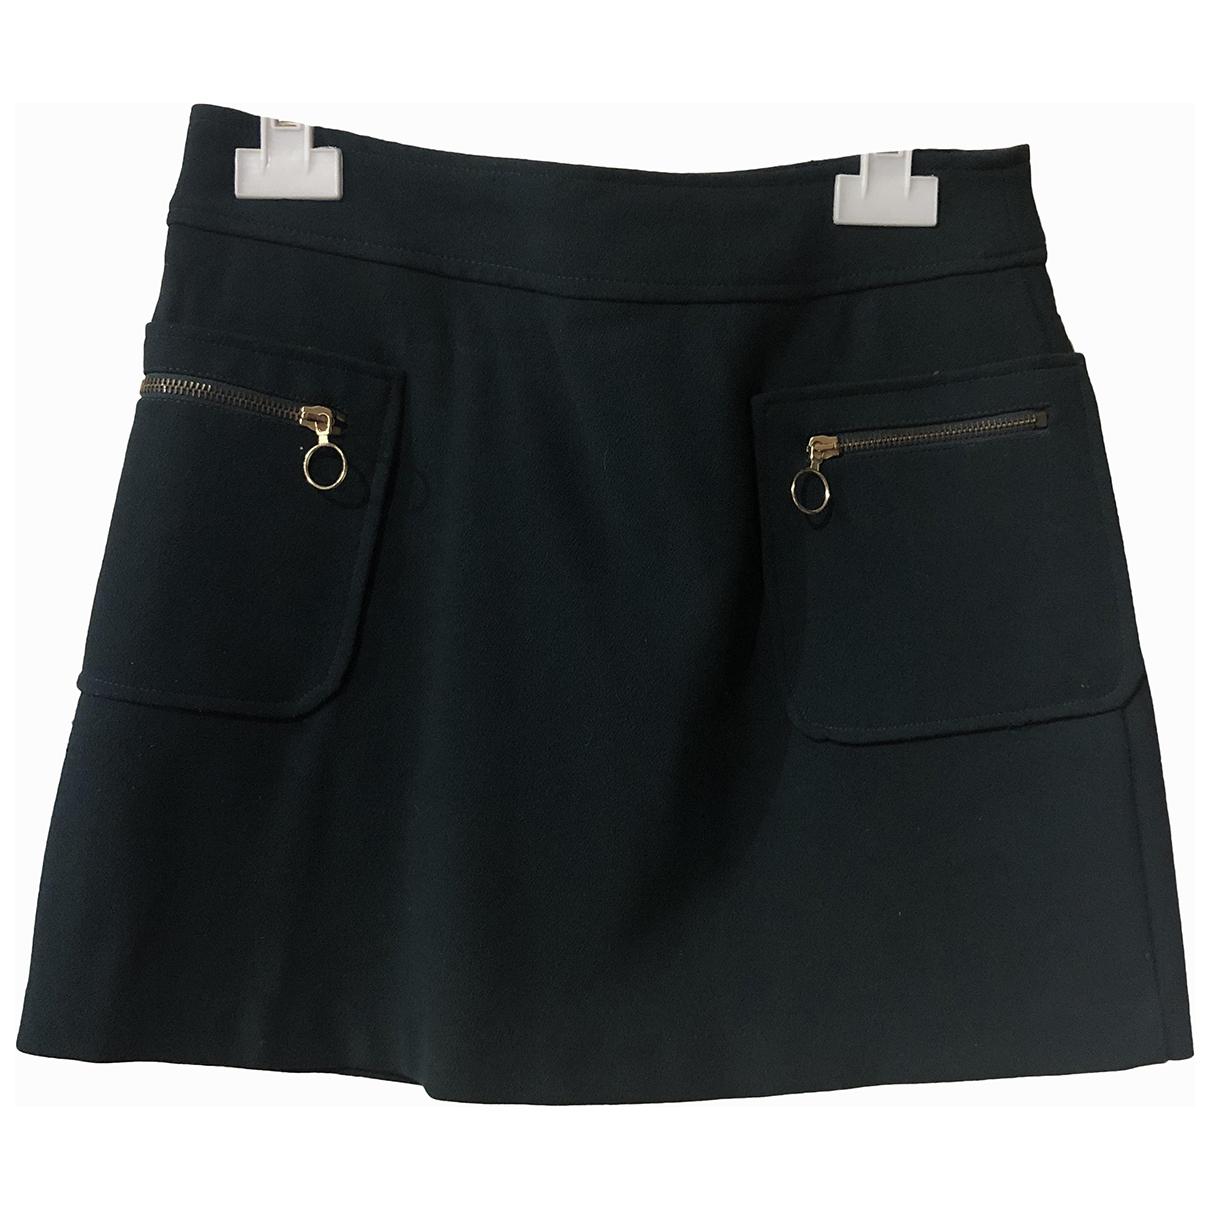 Essentiel Antwerp \N Green skirt for Women 36 FR